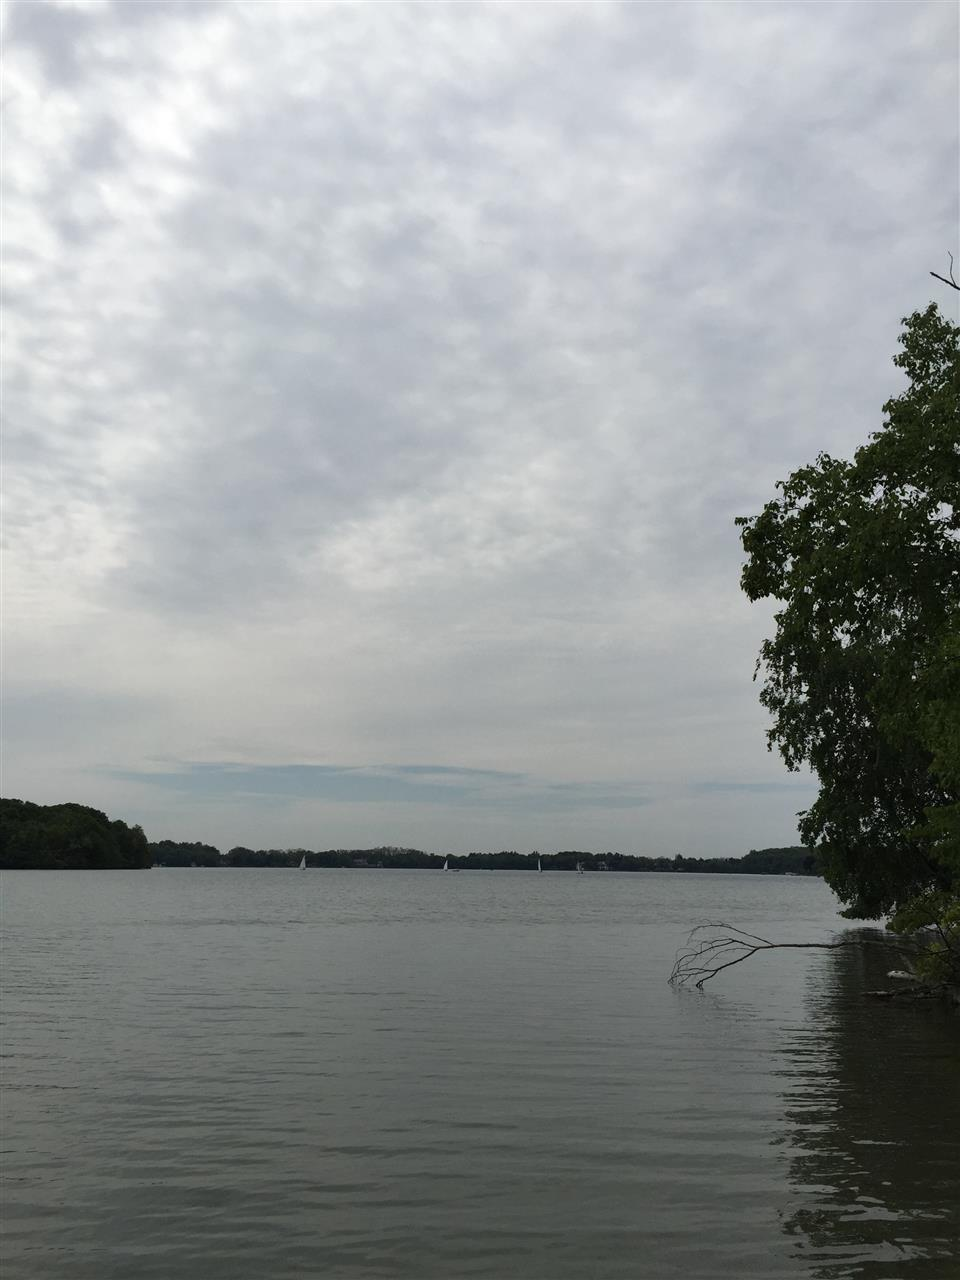 Orchard Lake view. Orchard Lake, Michigan #LeadingRElocal #OrchardLake #Michigan